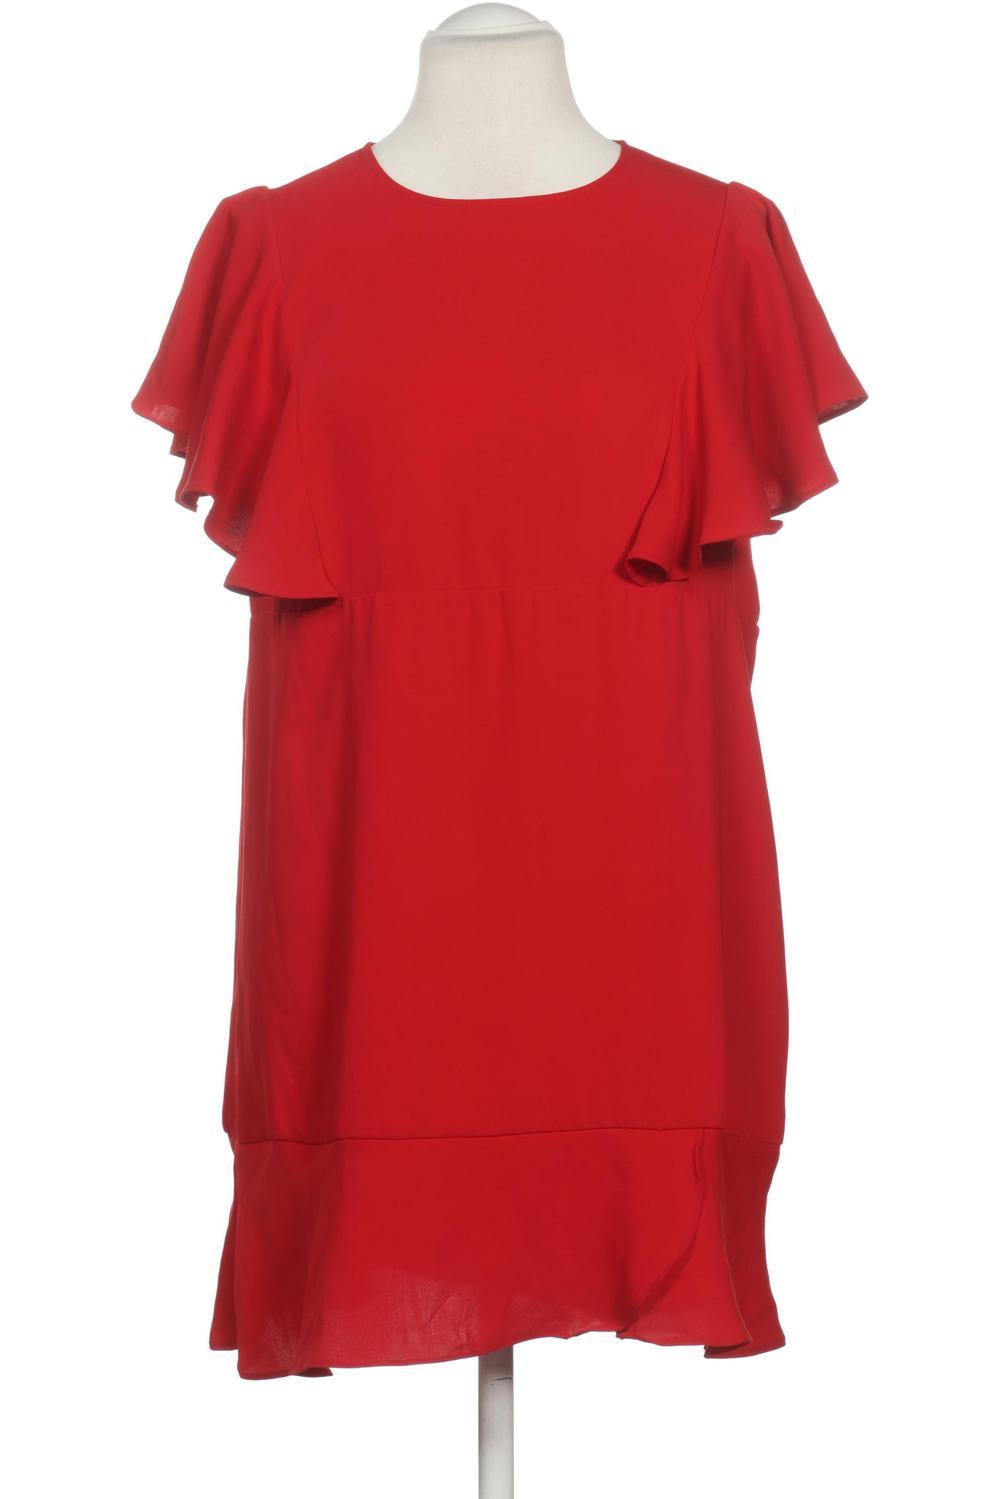 MANGO Kleid Damen Dress Damenkleid Gr. L kein Etikett rot ...